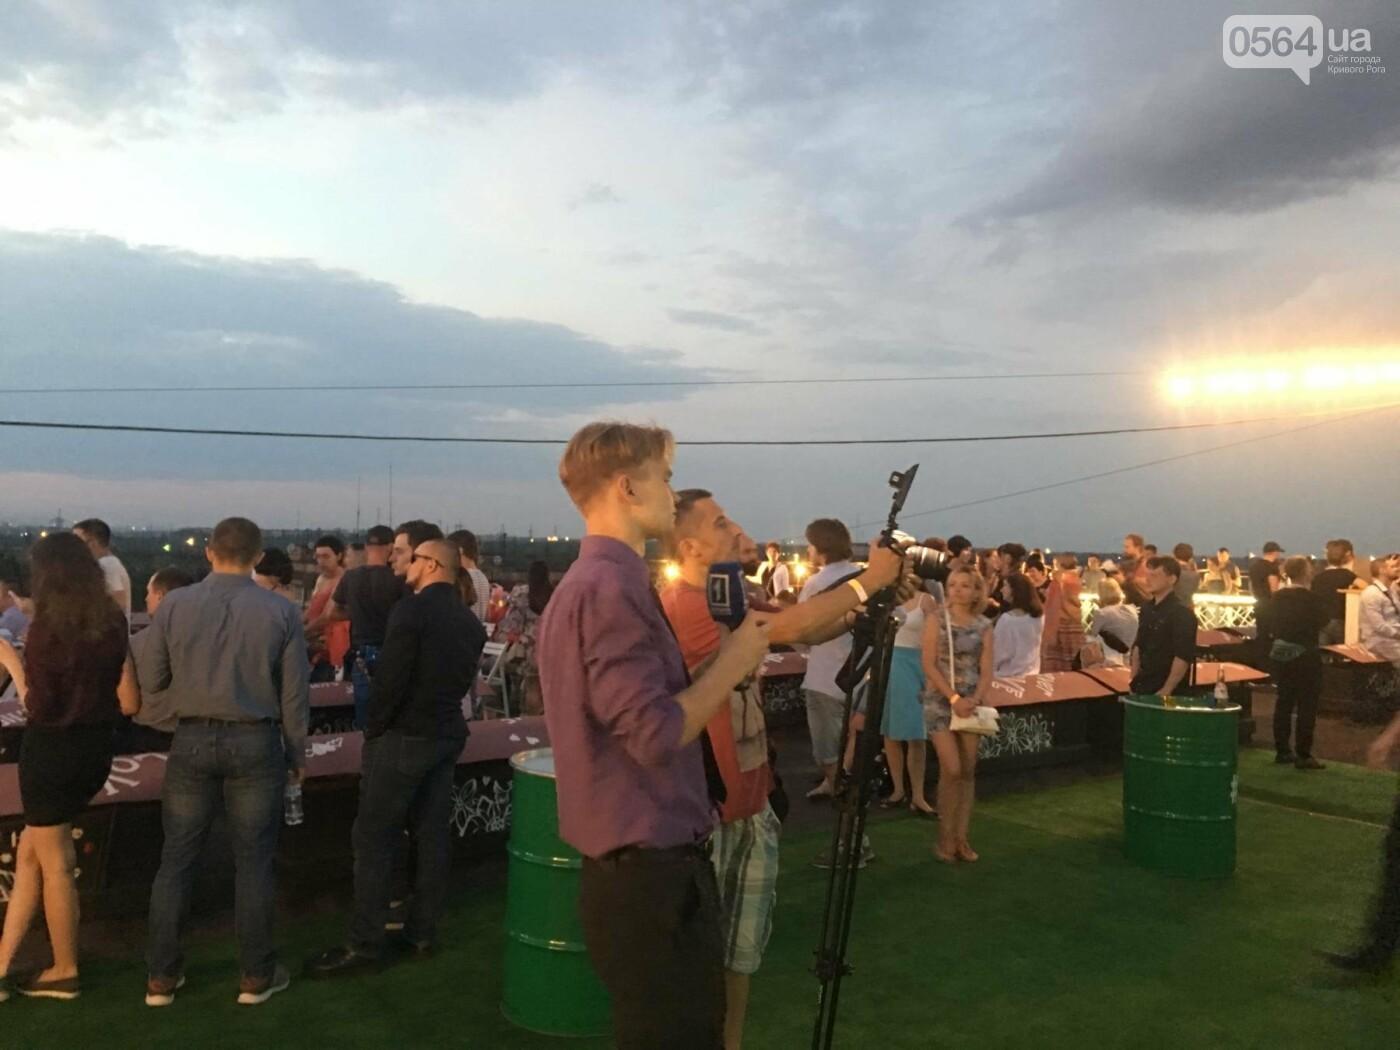 Сотни криворожан встречали закат на крыше отеля под мелодии джаза, - ФОТО, ВИДЕО, фото-29